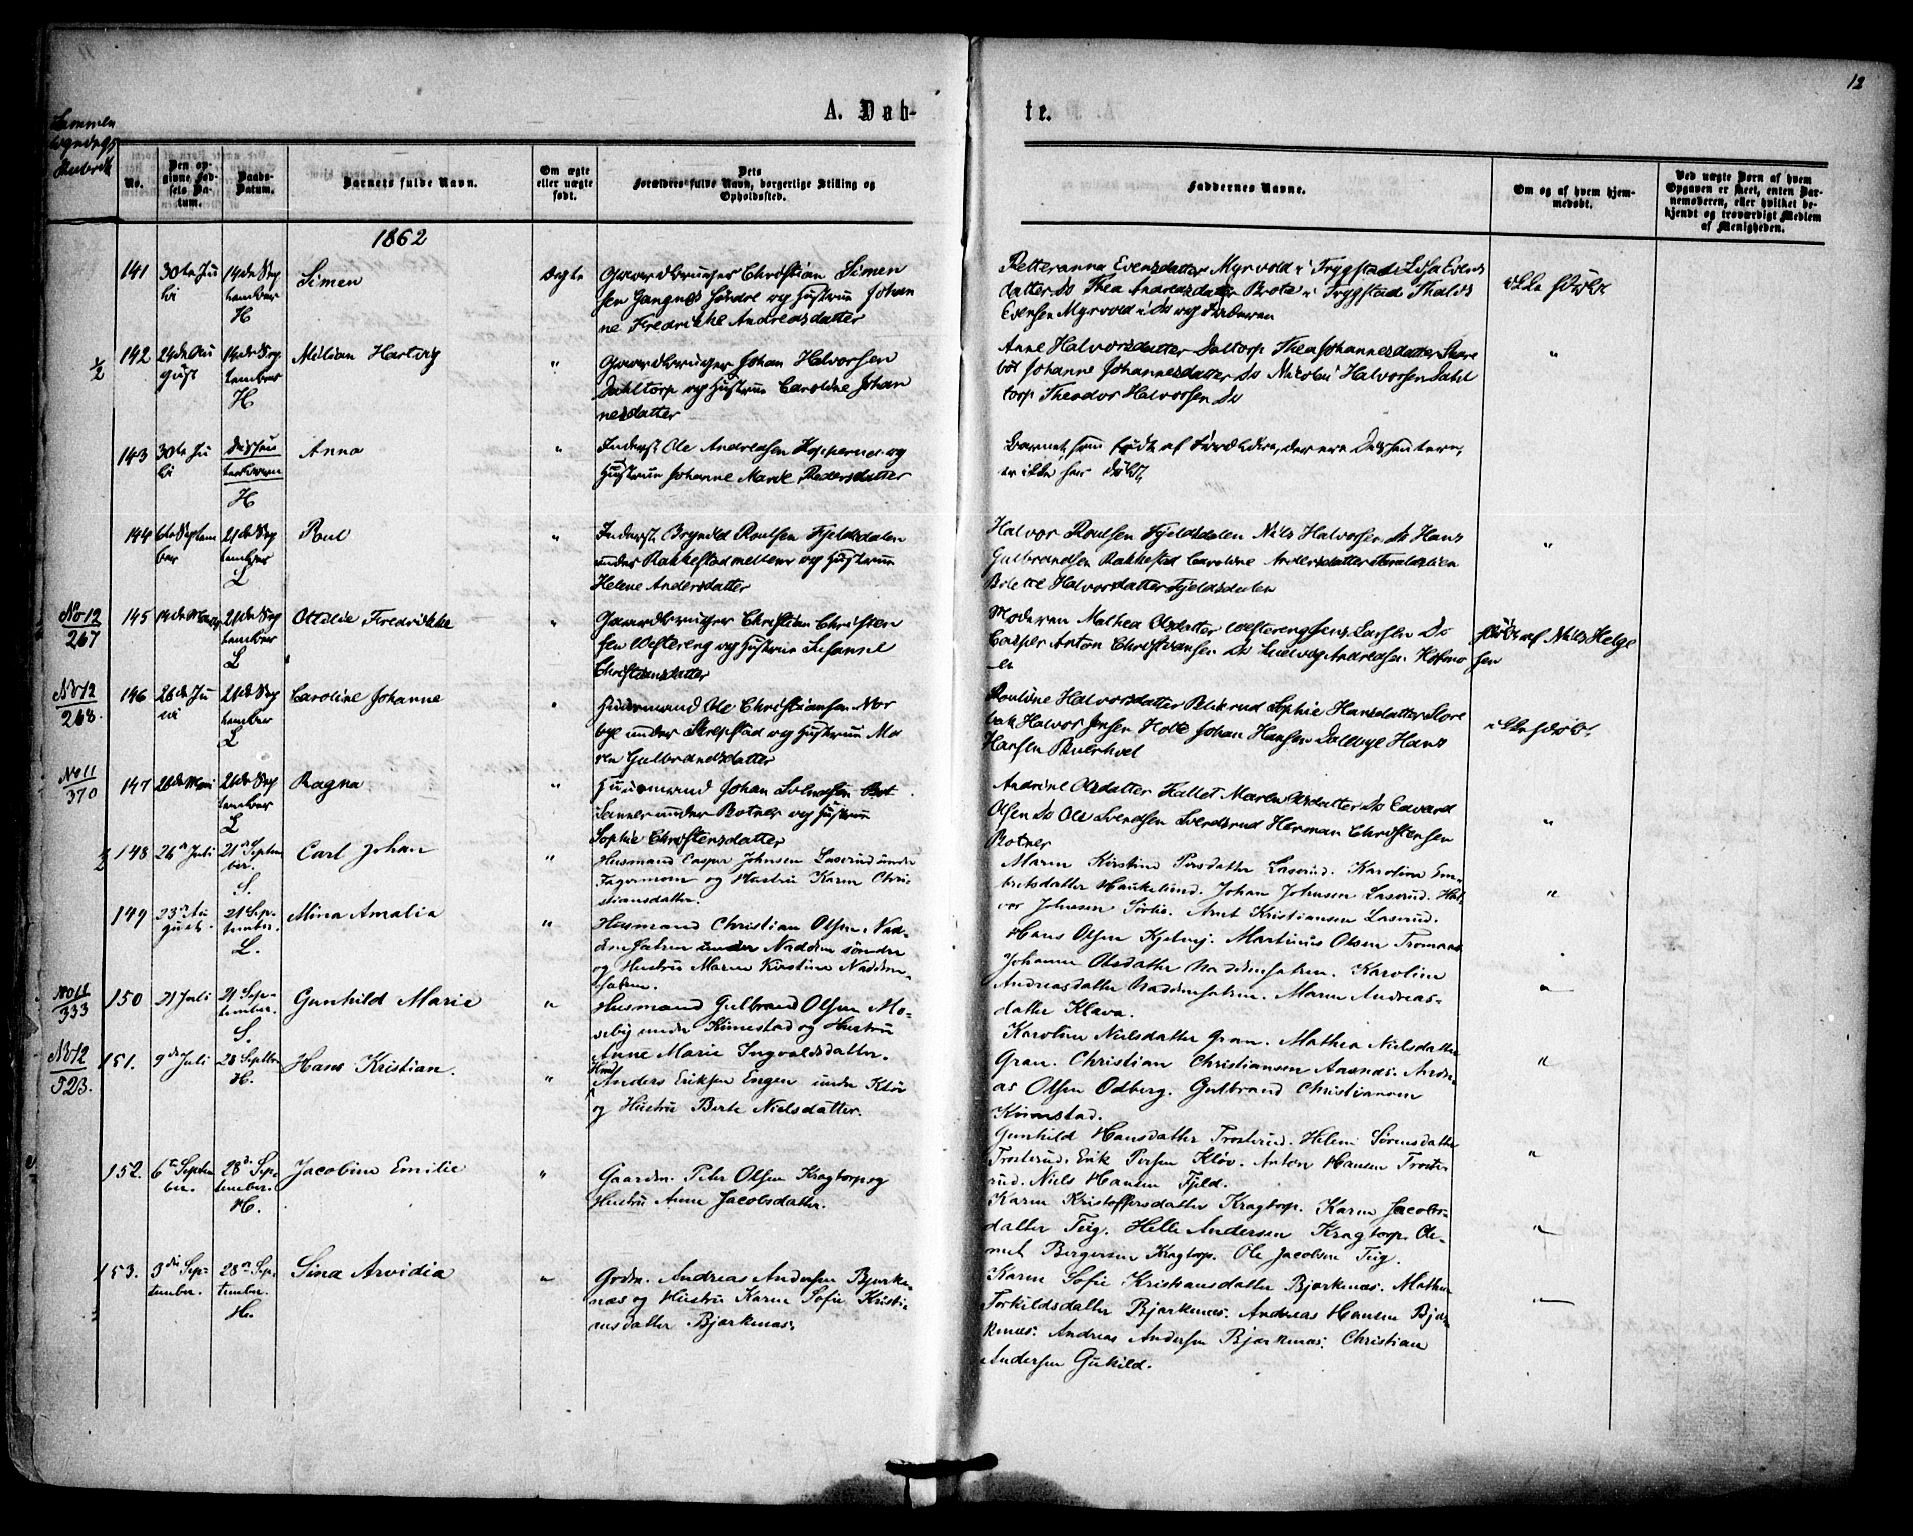 SAO, Høland prestekontor Kirkebøker, F/Fa/L0011: Ministerialbok nr. I 11, 1862-1869, s. 12